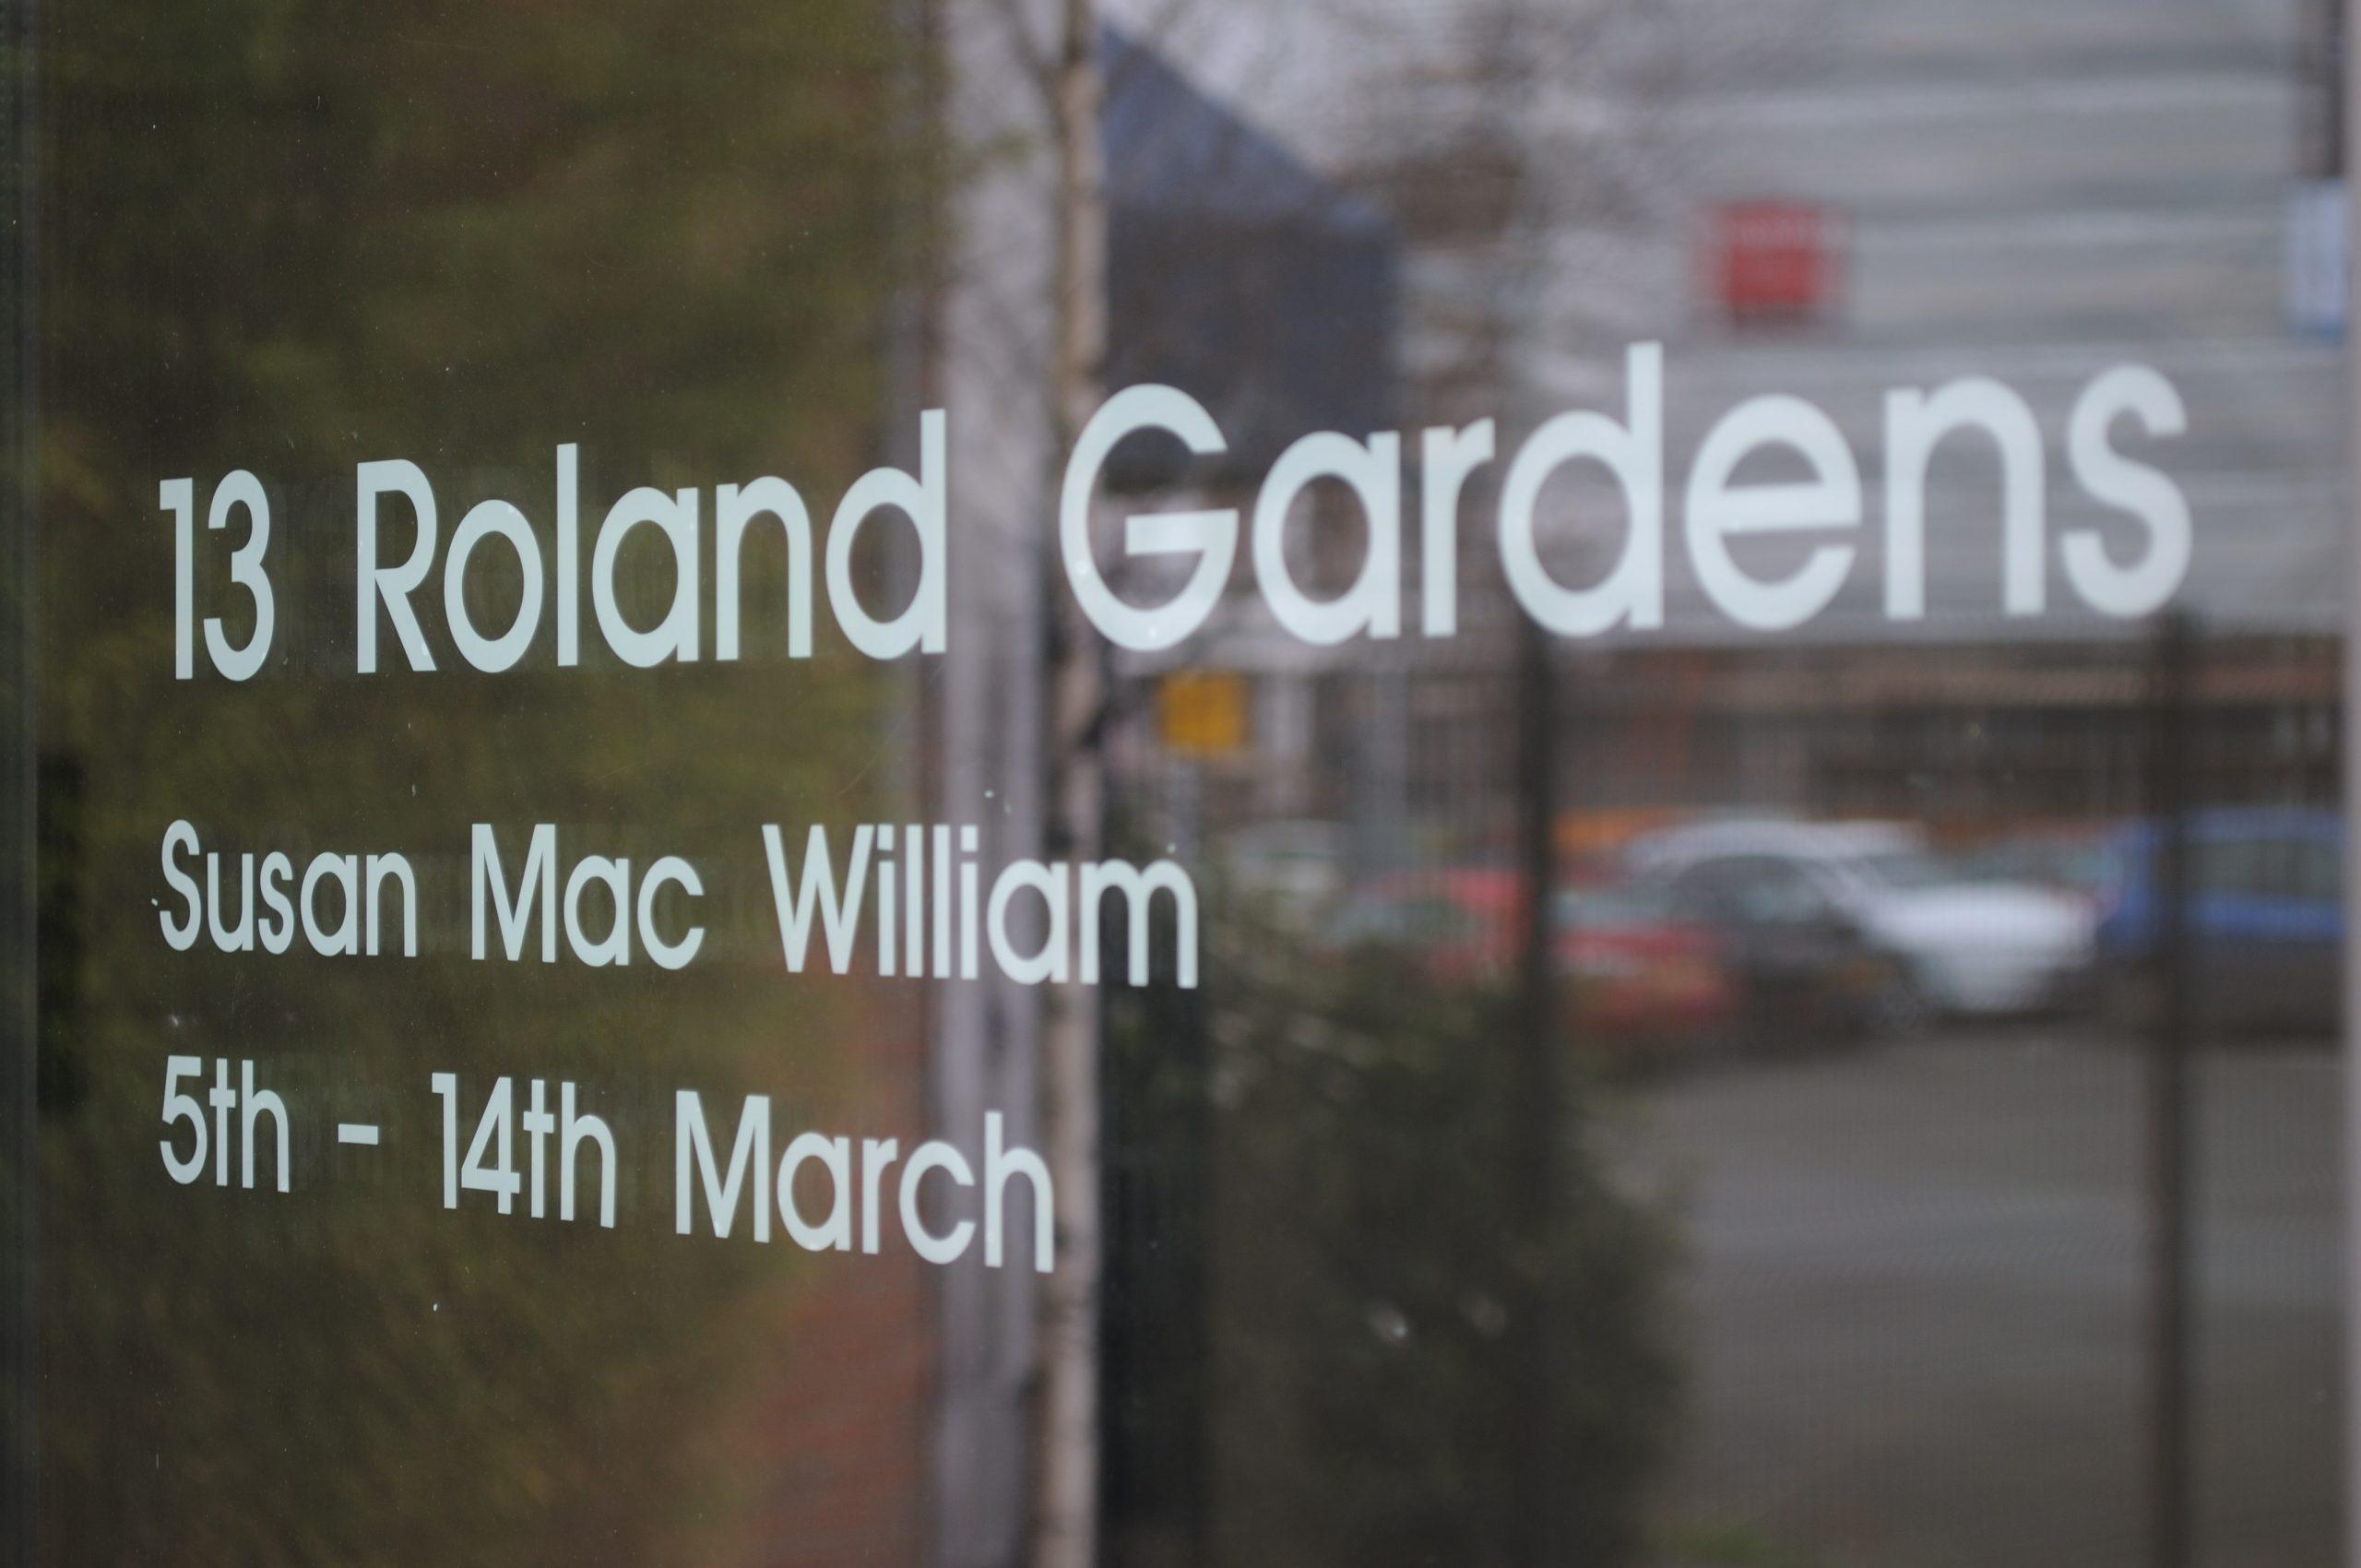 13 Roland Gardens